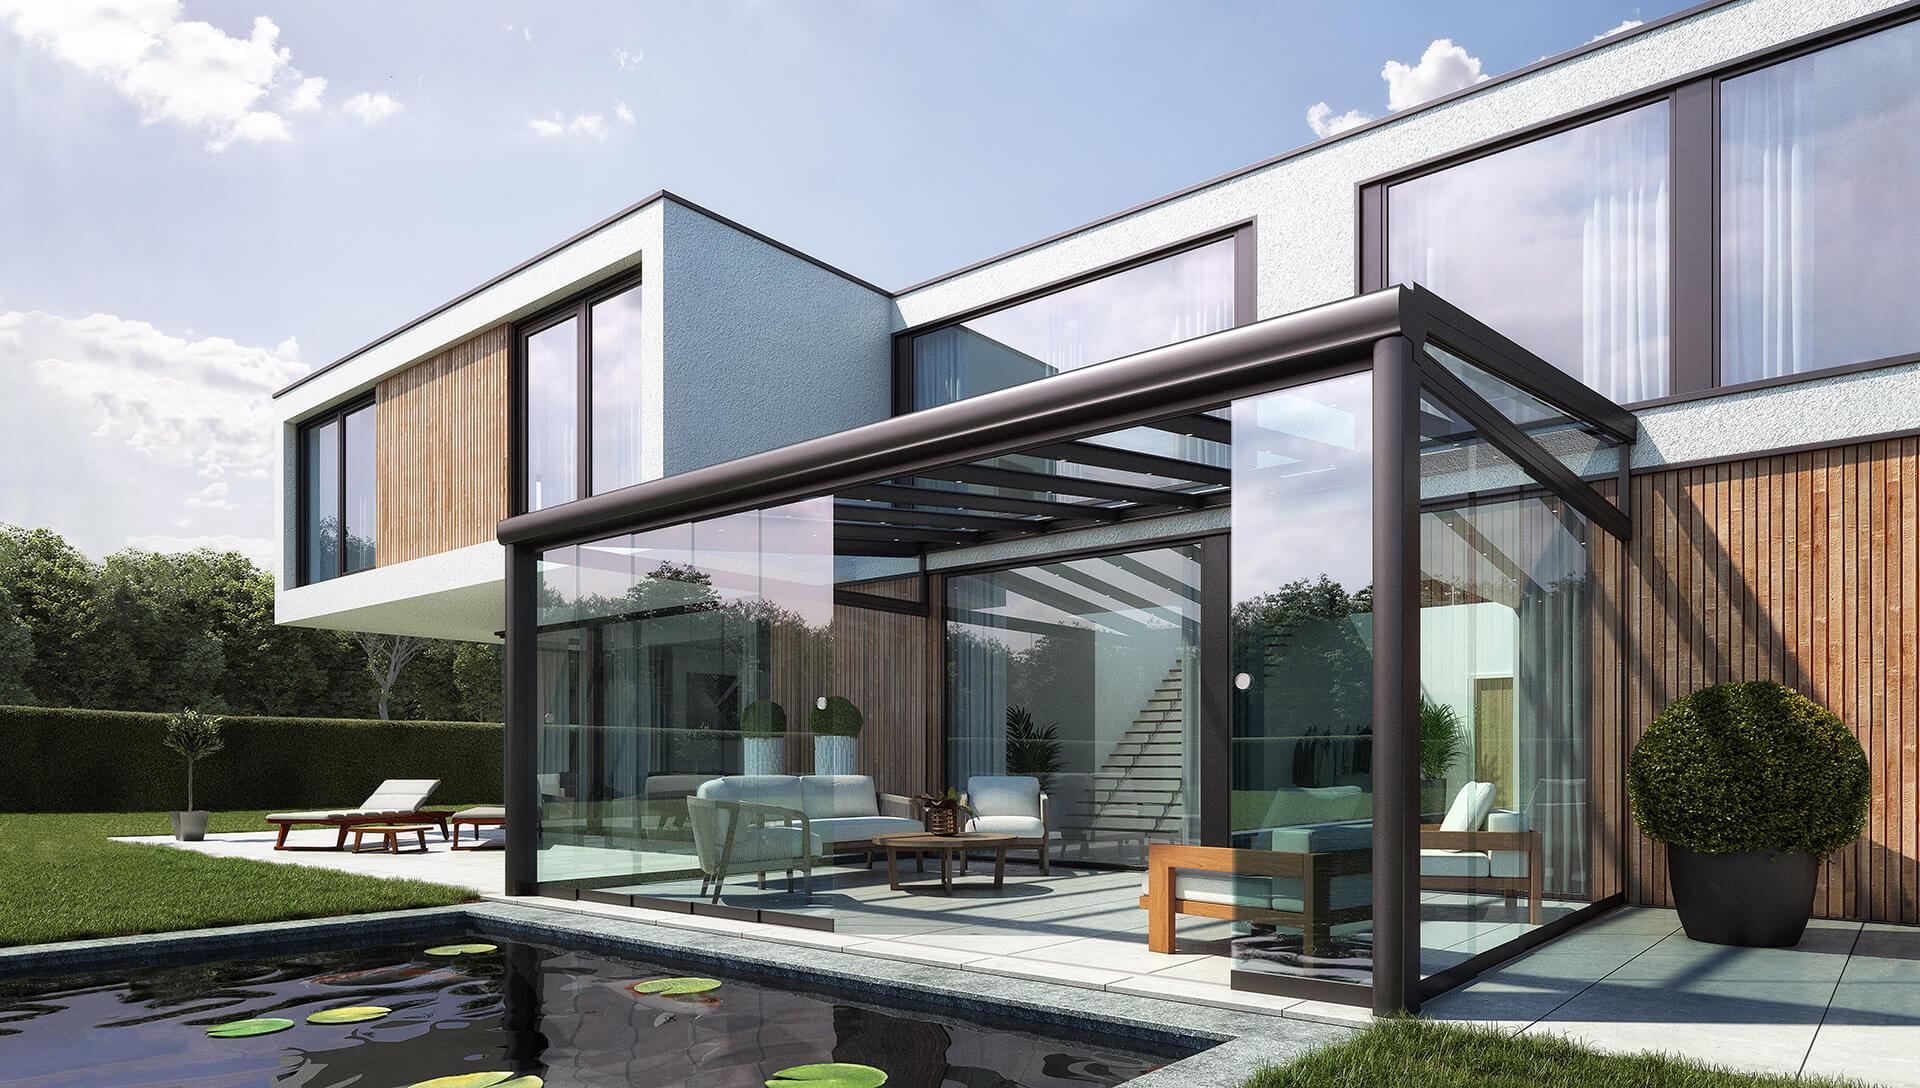 AGI Concepts - Outdoor Patio Canopies